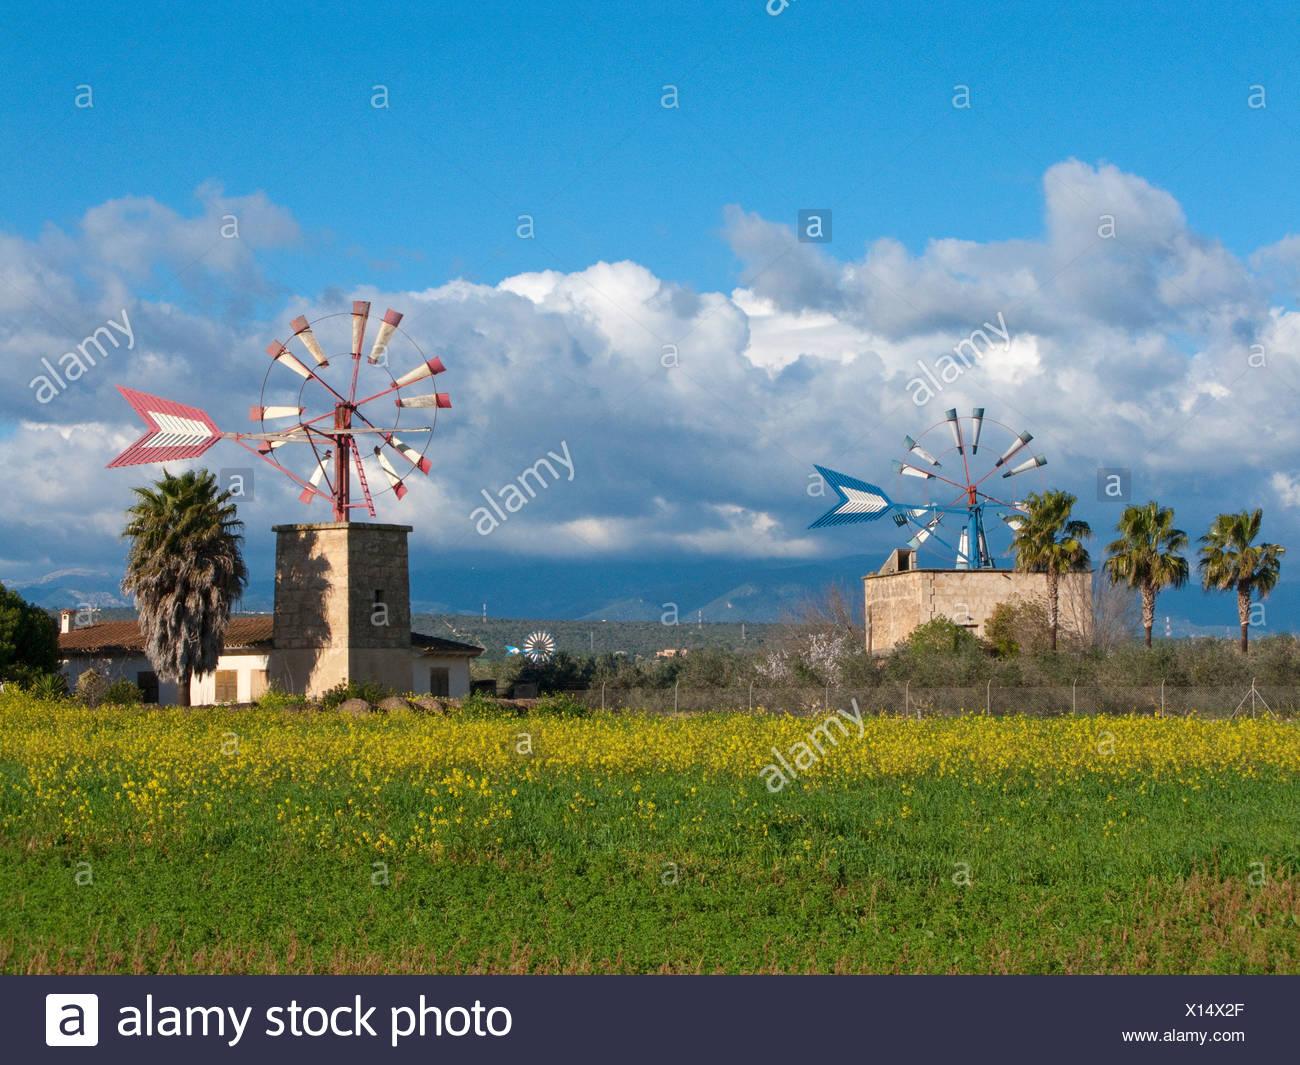 Wind mills, water pumping windmills near Sant Jordi, Majorca, Balearic islands, Spain, Europe - Stock Image